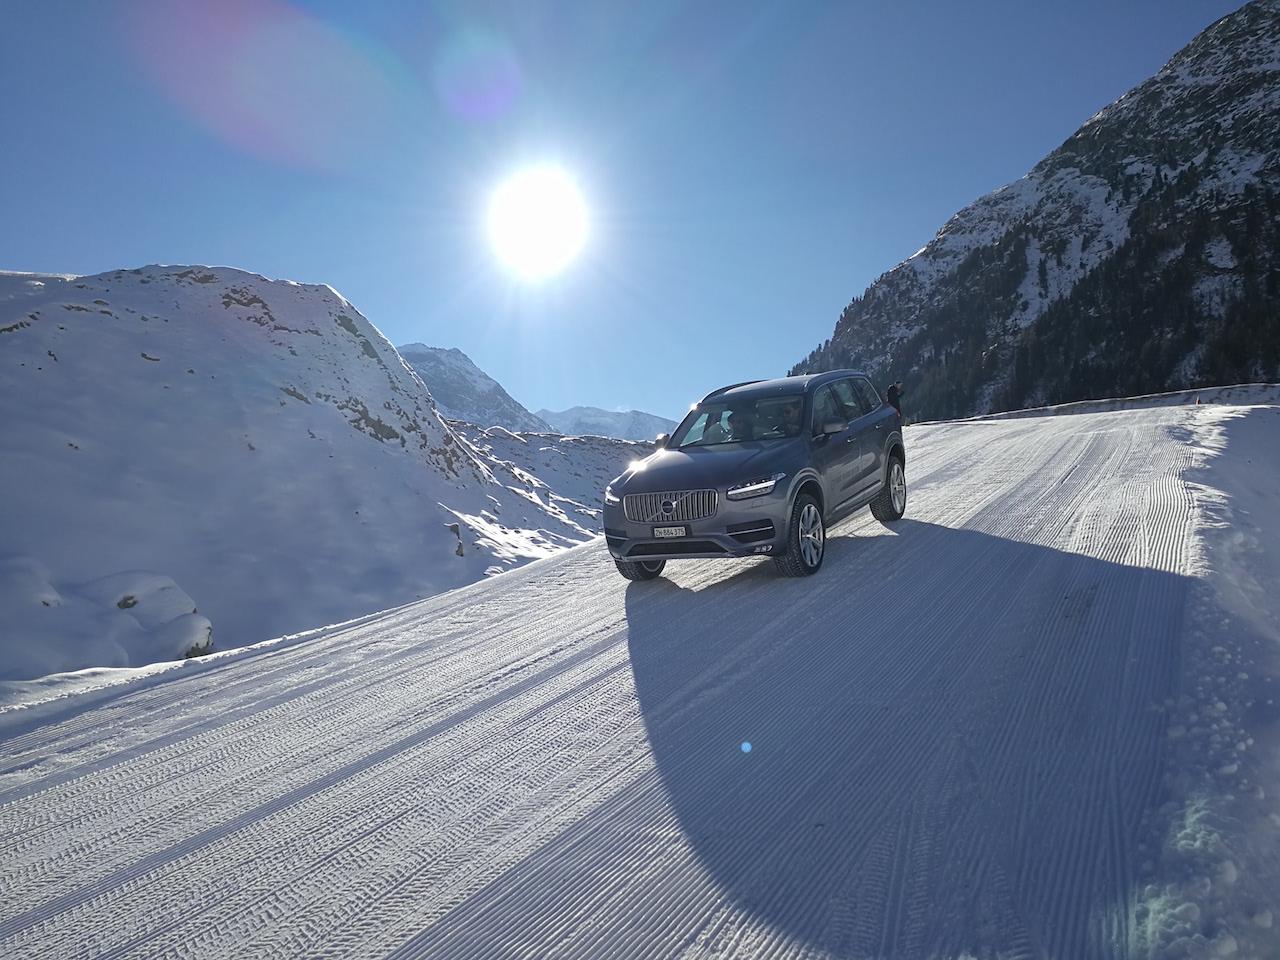 Volvo Winterfahrtraining Samedan 2017 5